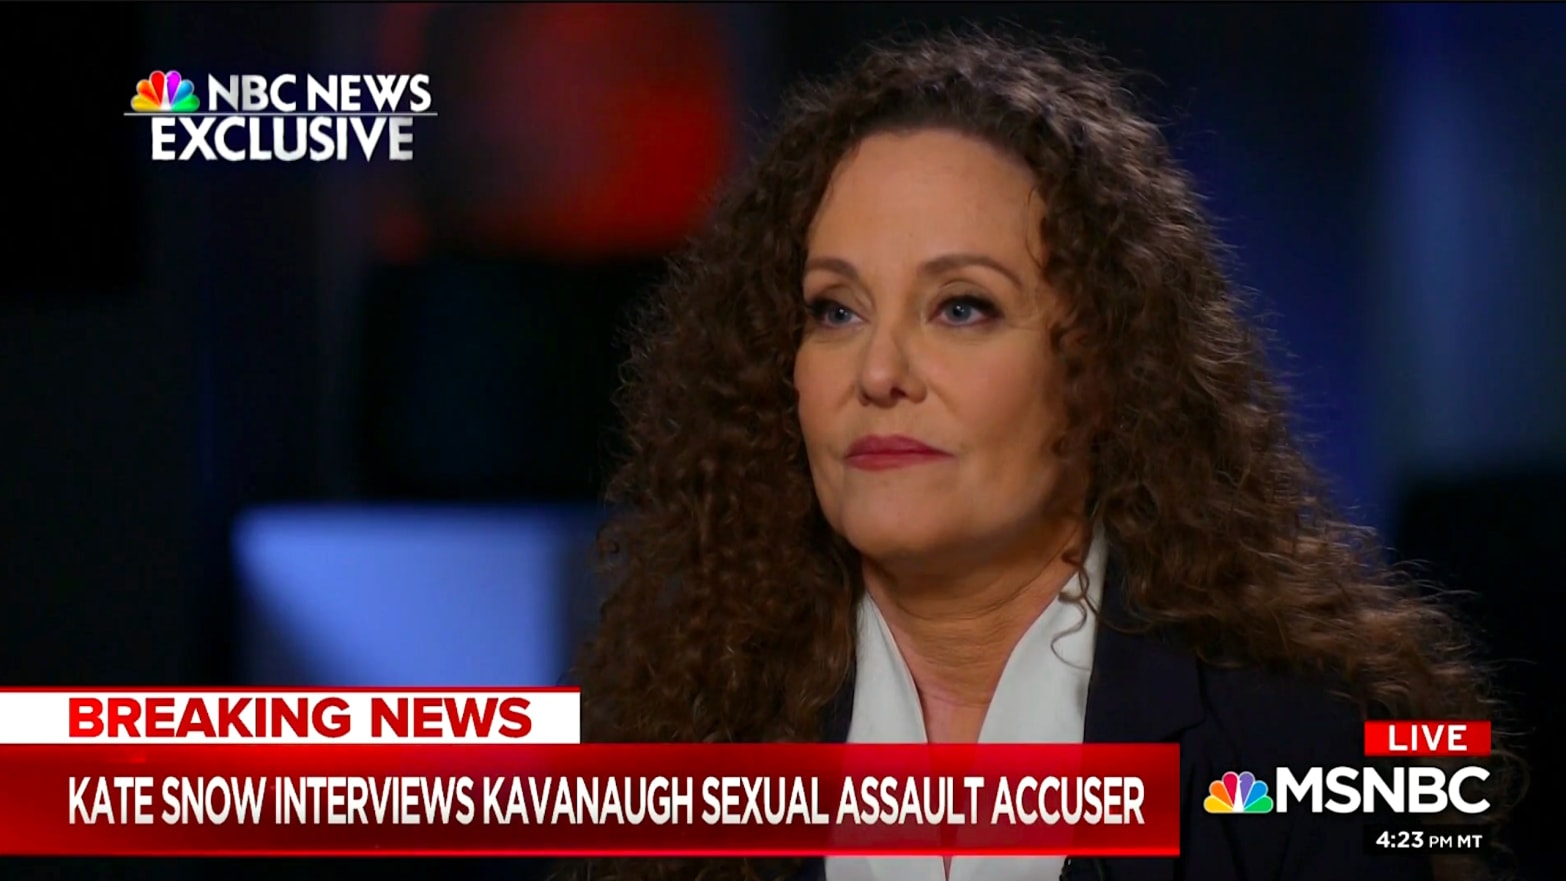 Julie Swetnick Grilled About Kavanaugh, 'Gang Rape' in MSNBC